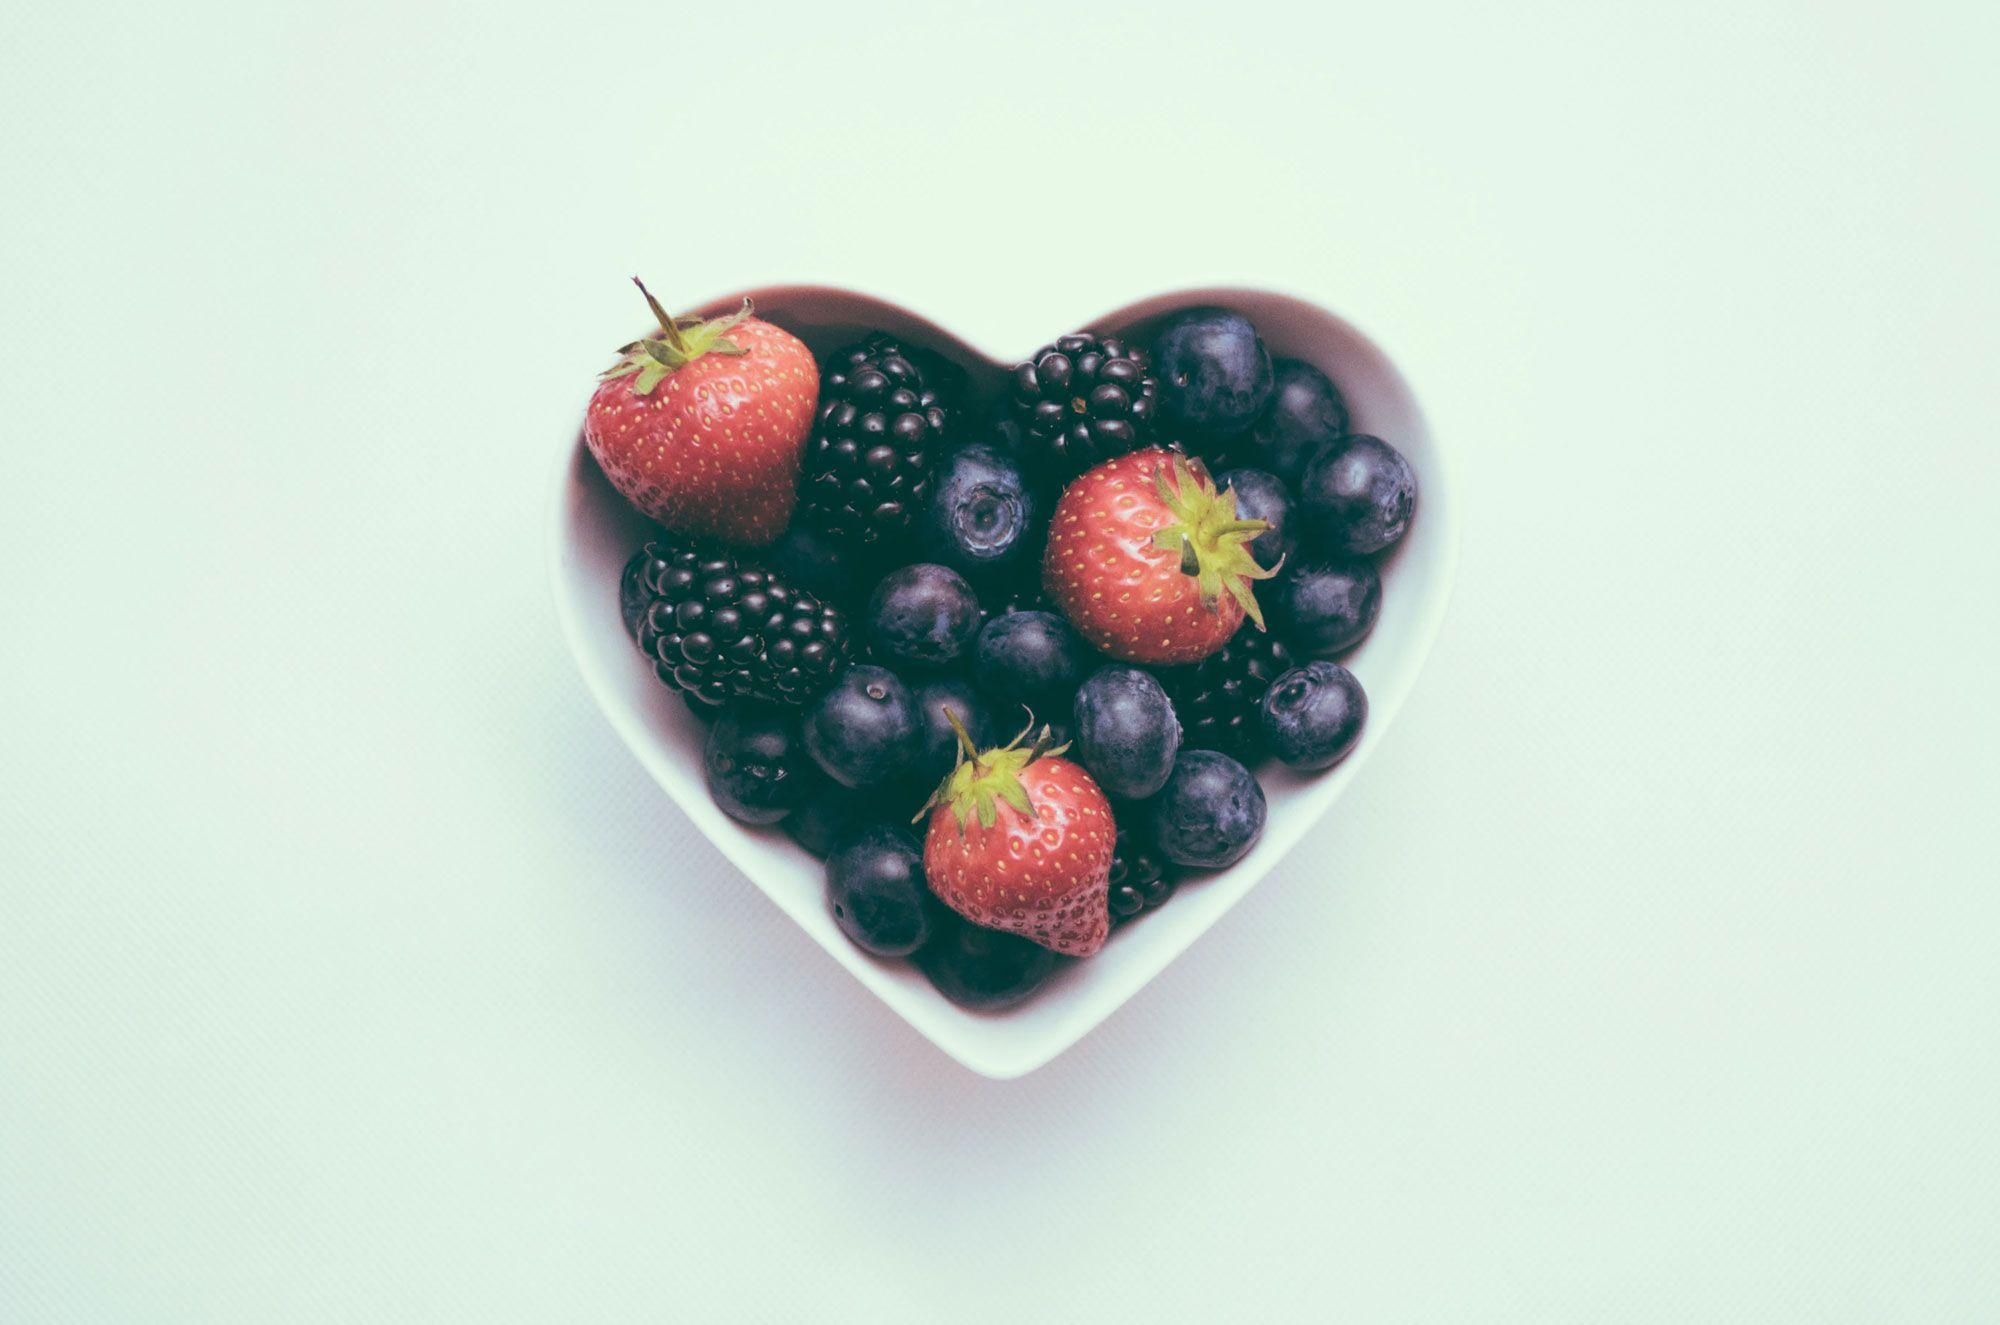 frpzen fruit are as good as fresh fruits